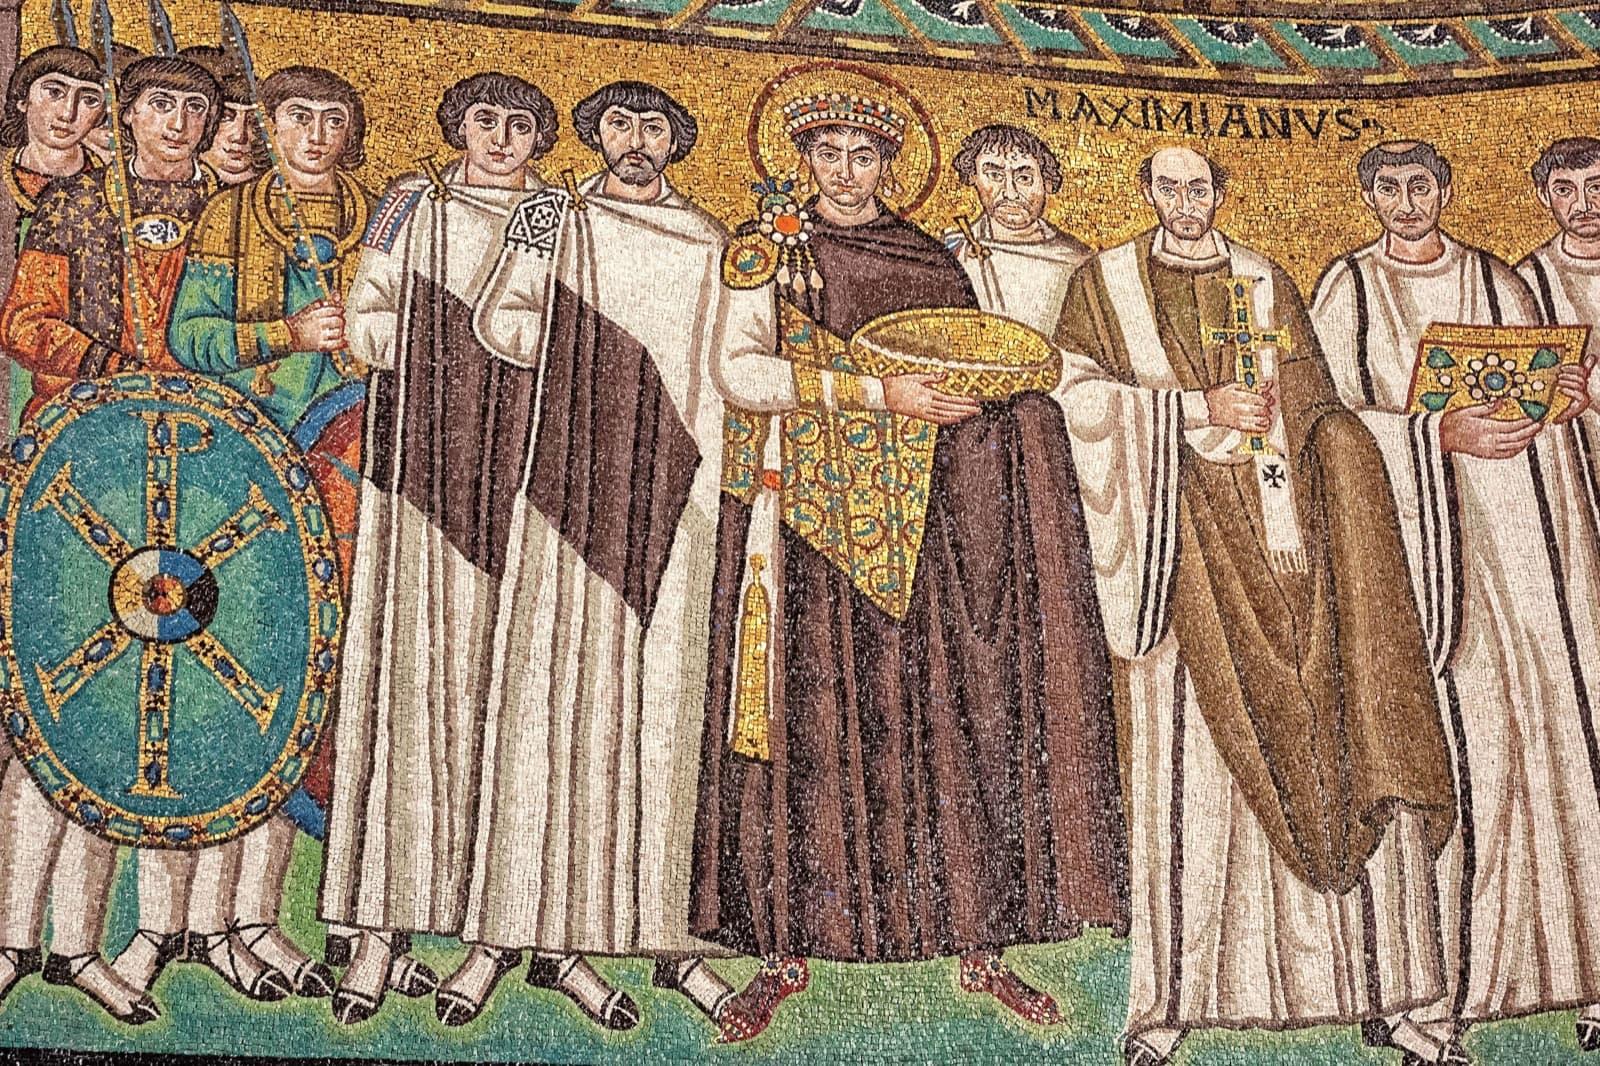 Ravenna 's Mosaics - Roads of Dante